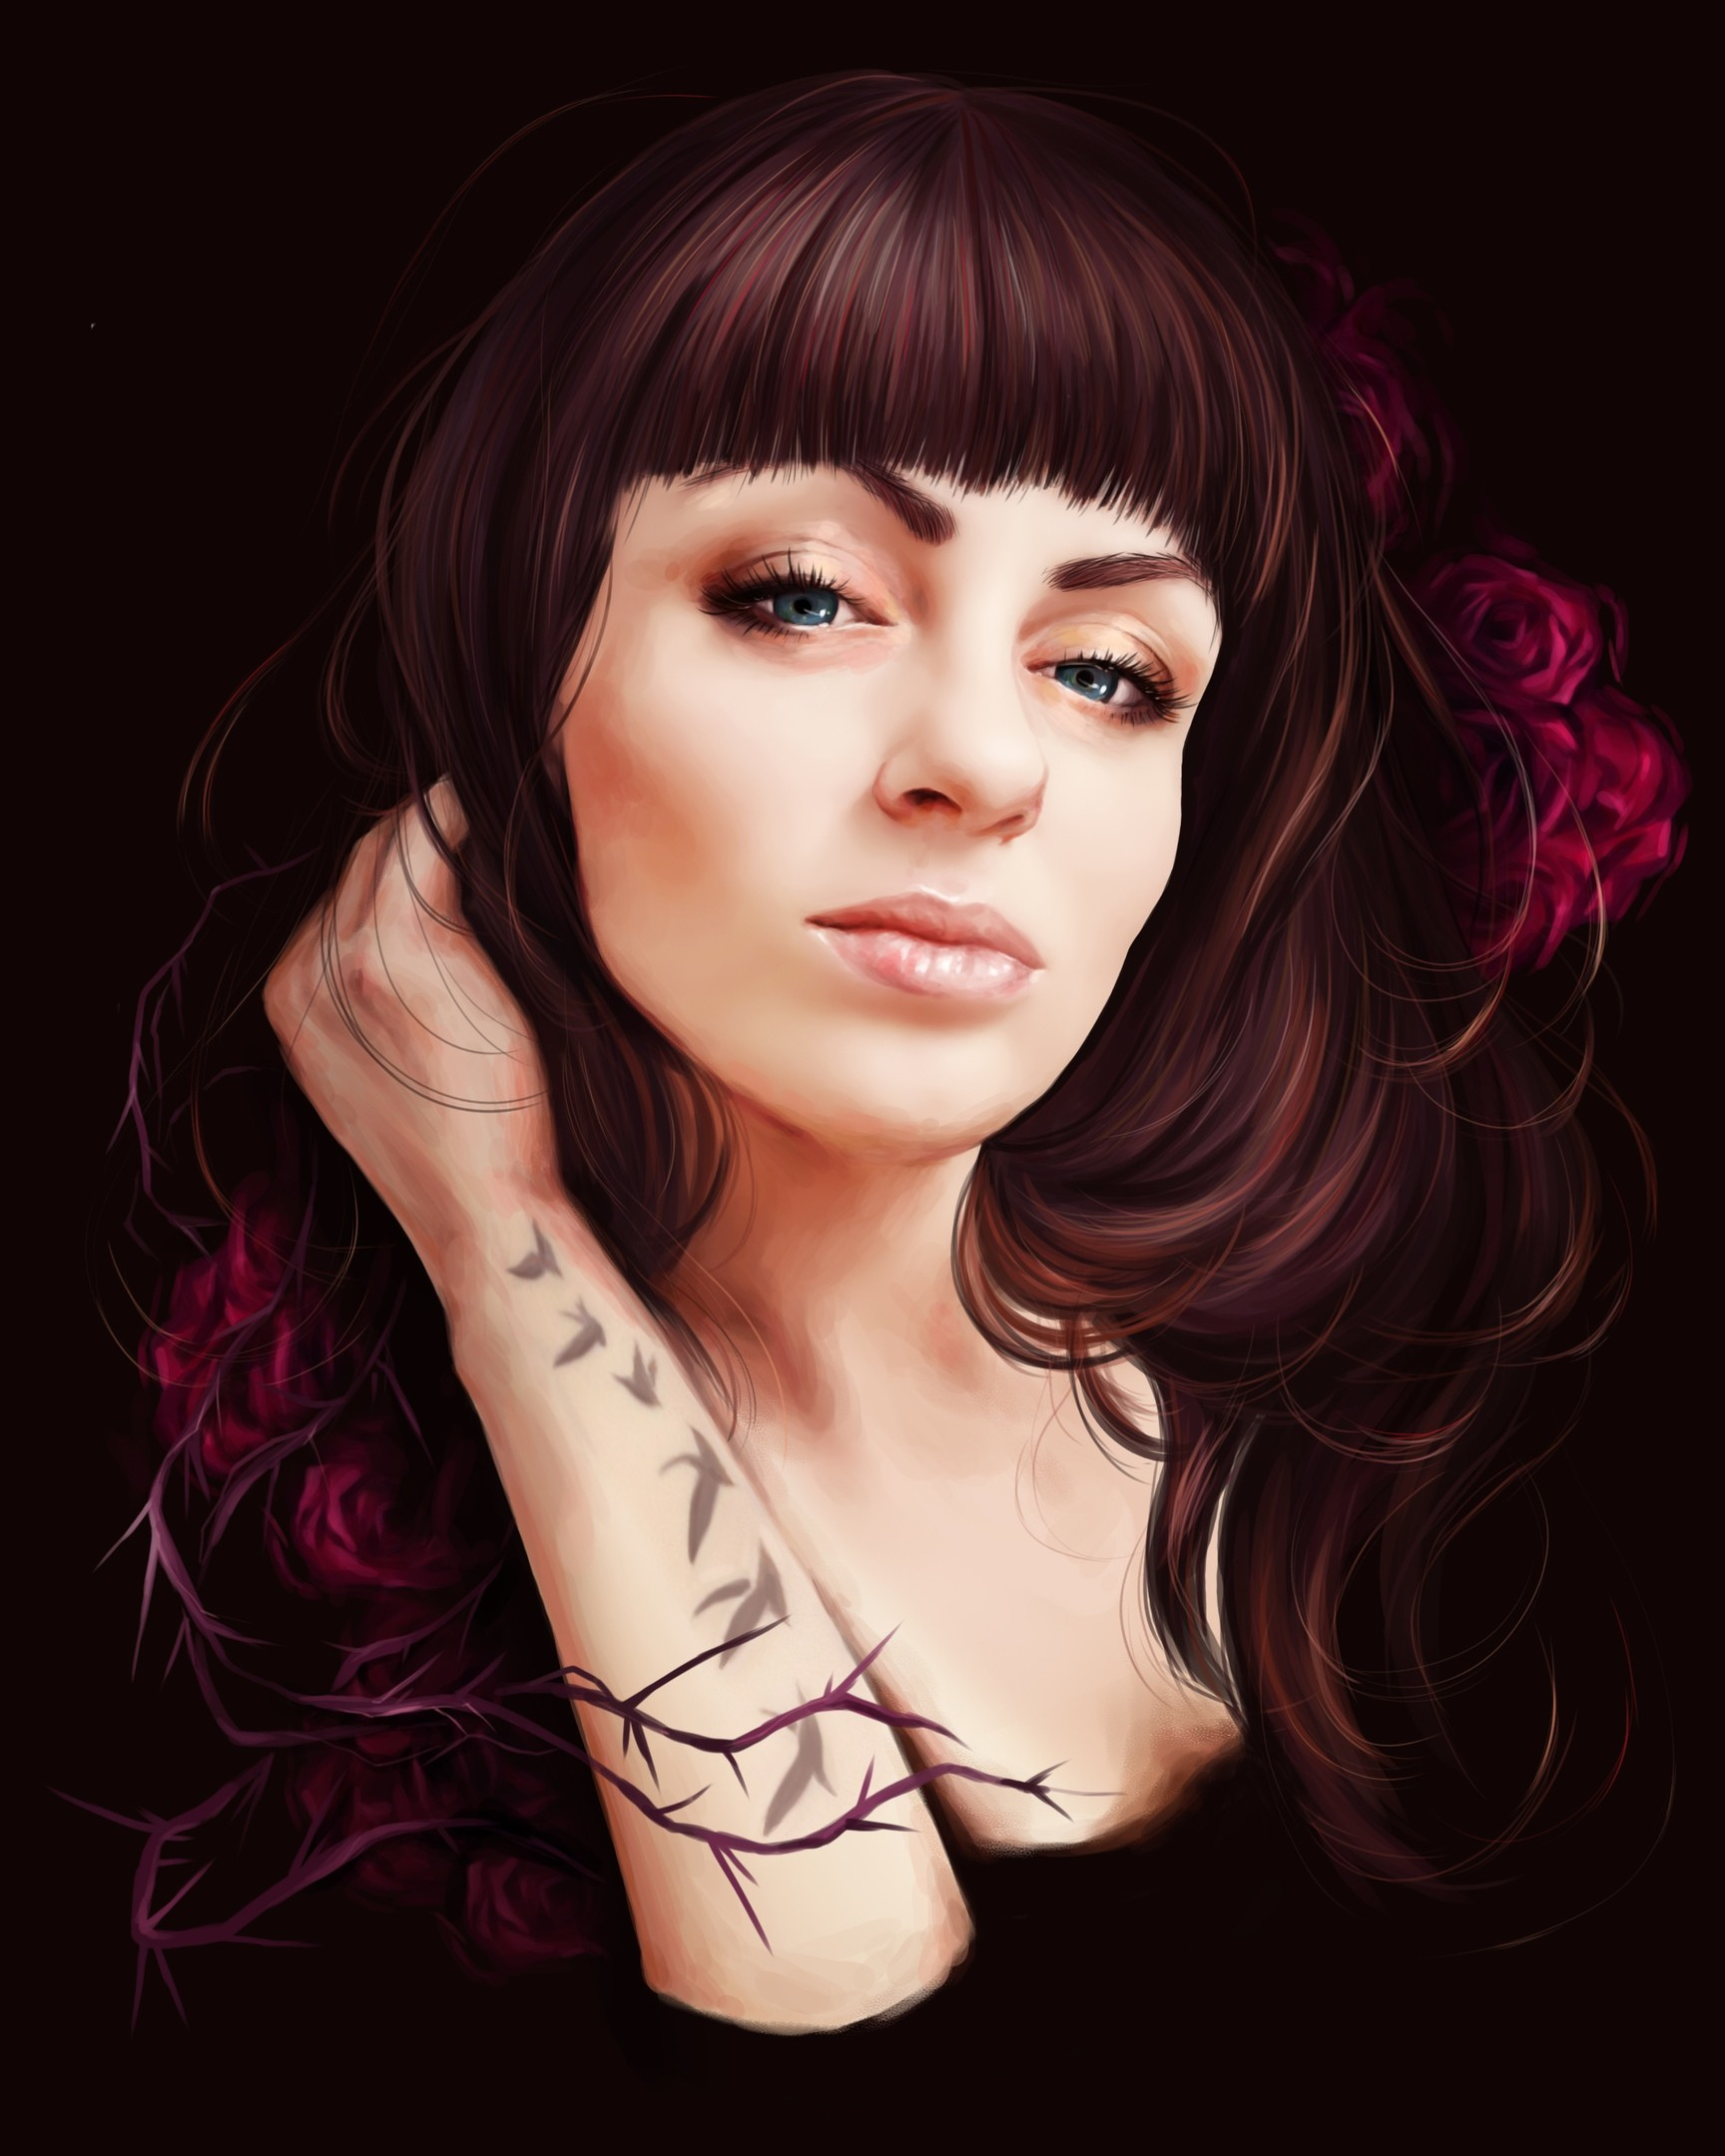 Портрет девушки цифровая живопись